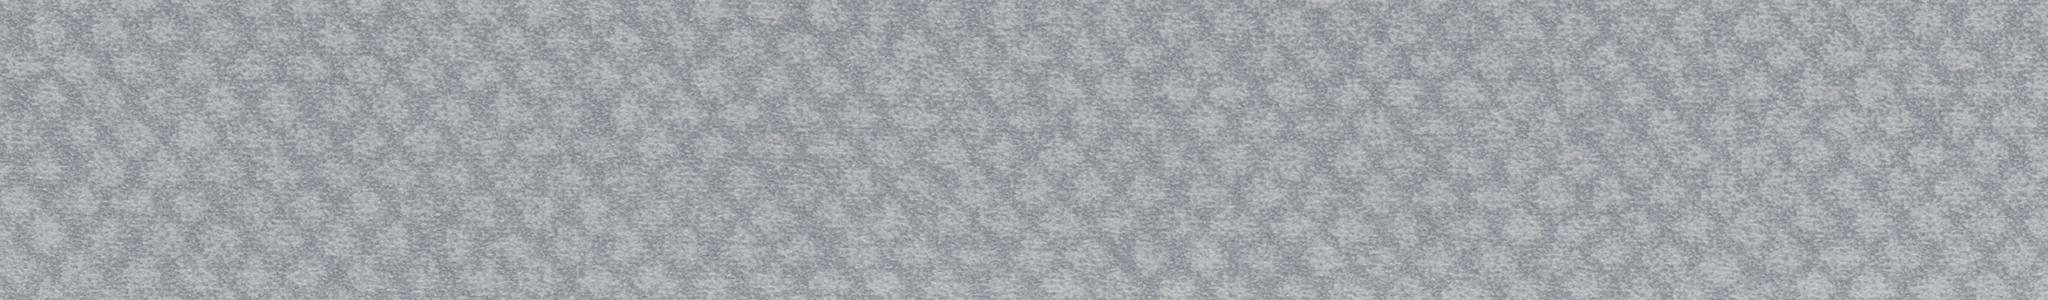 HD 296117 Кромка ABS Пике Серо-Синий - Шагрень